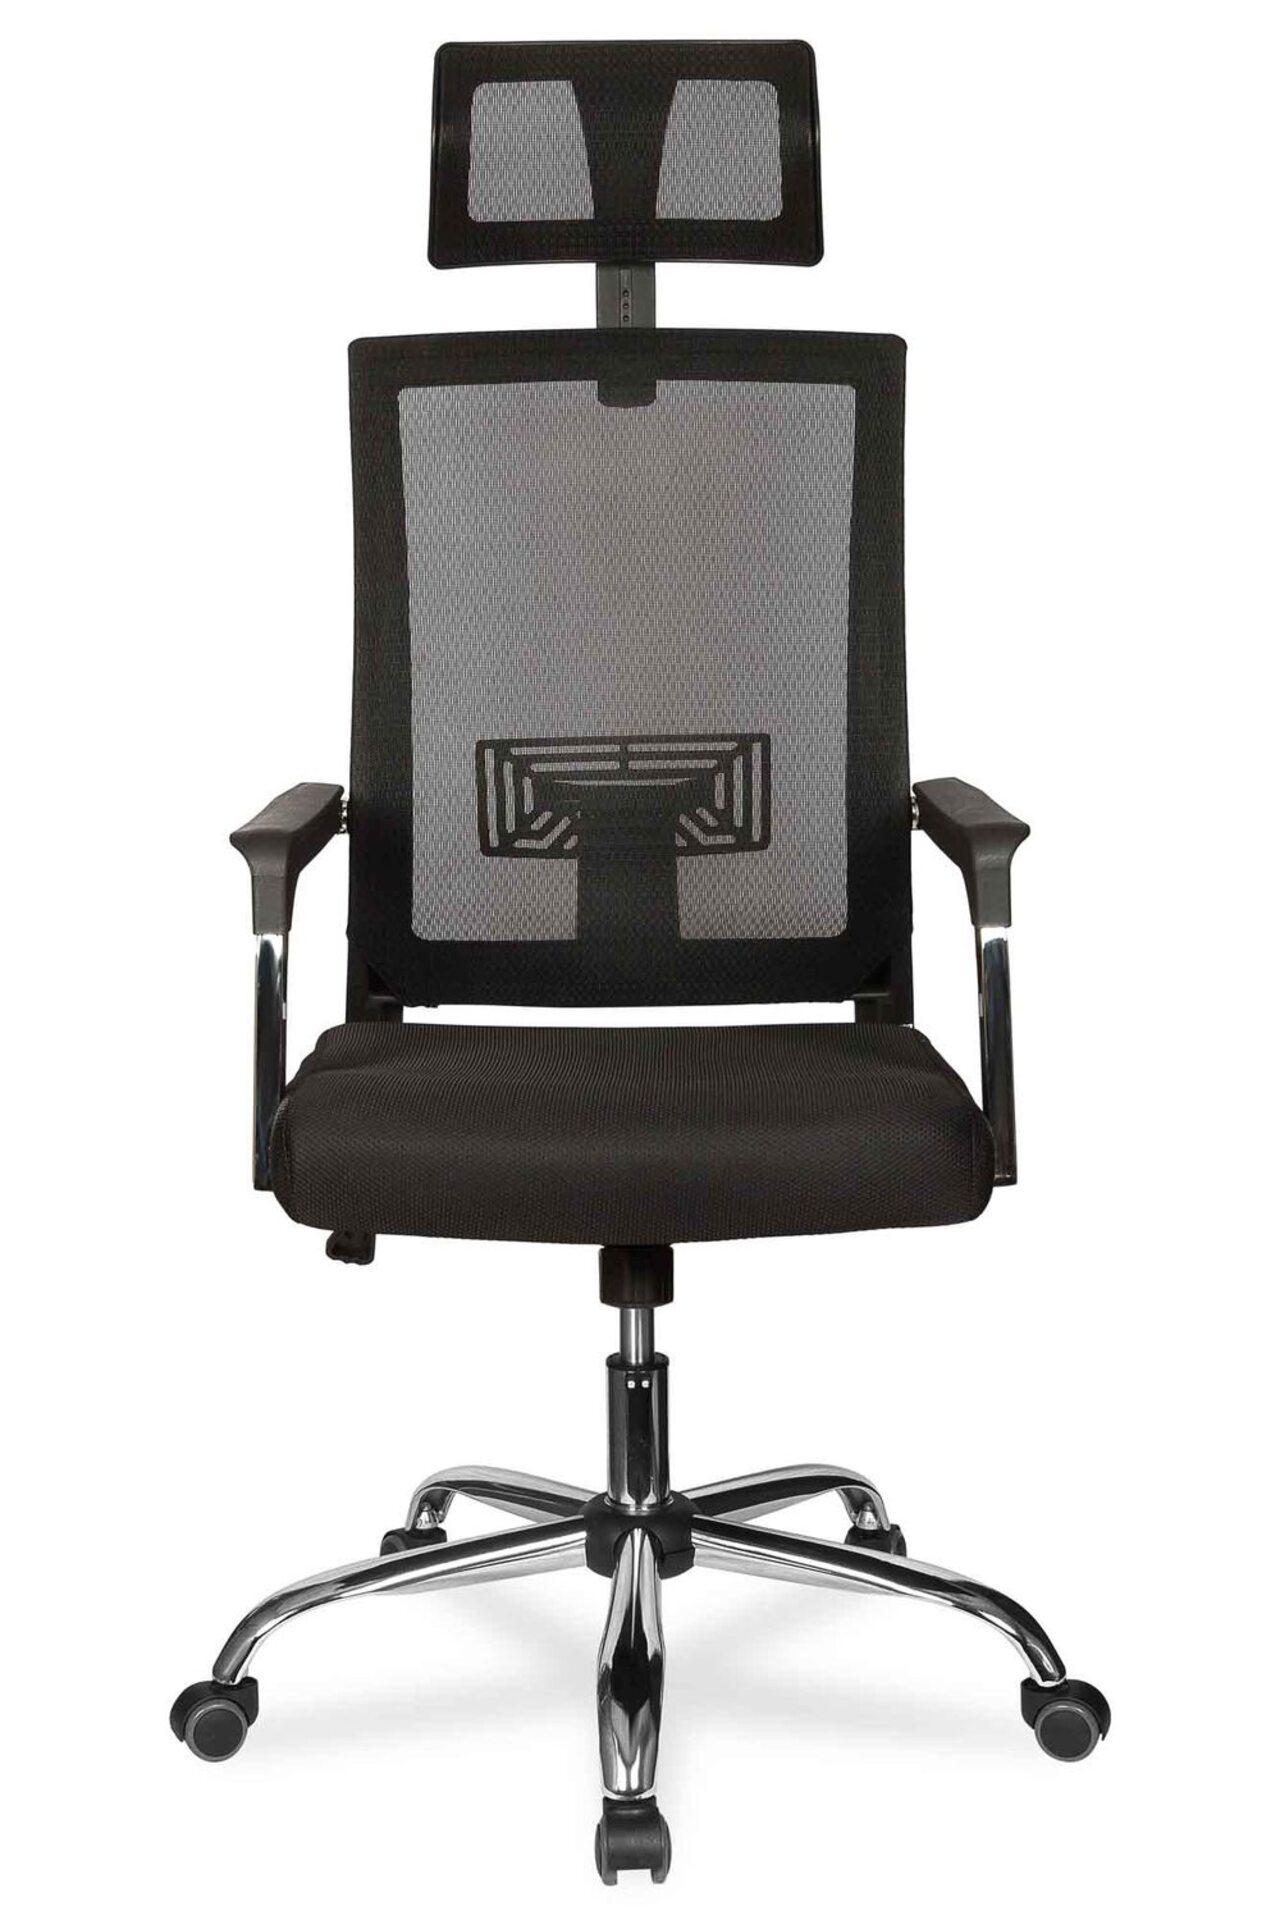 Кресло руководителя College CLG-423 MXH-A - фото 5